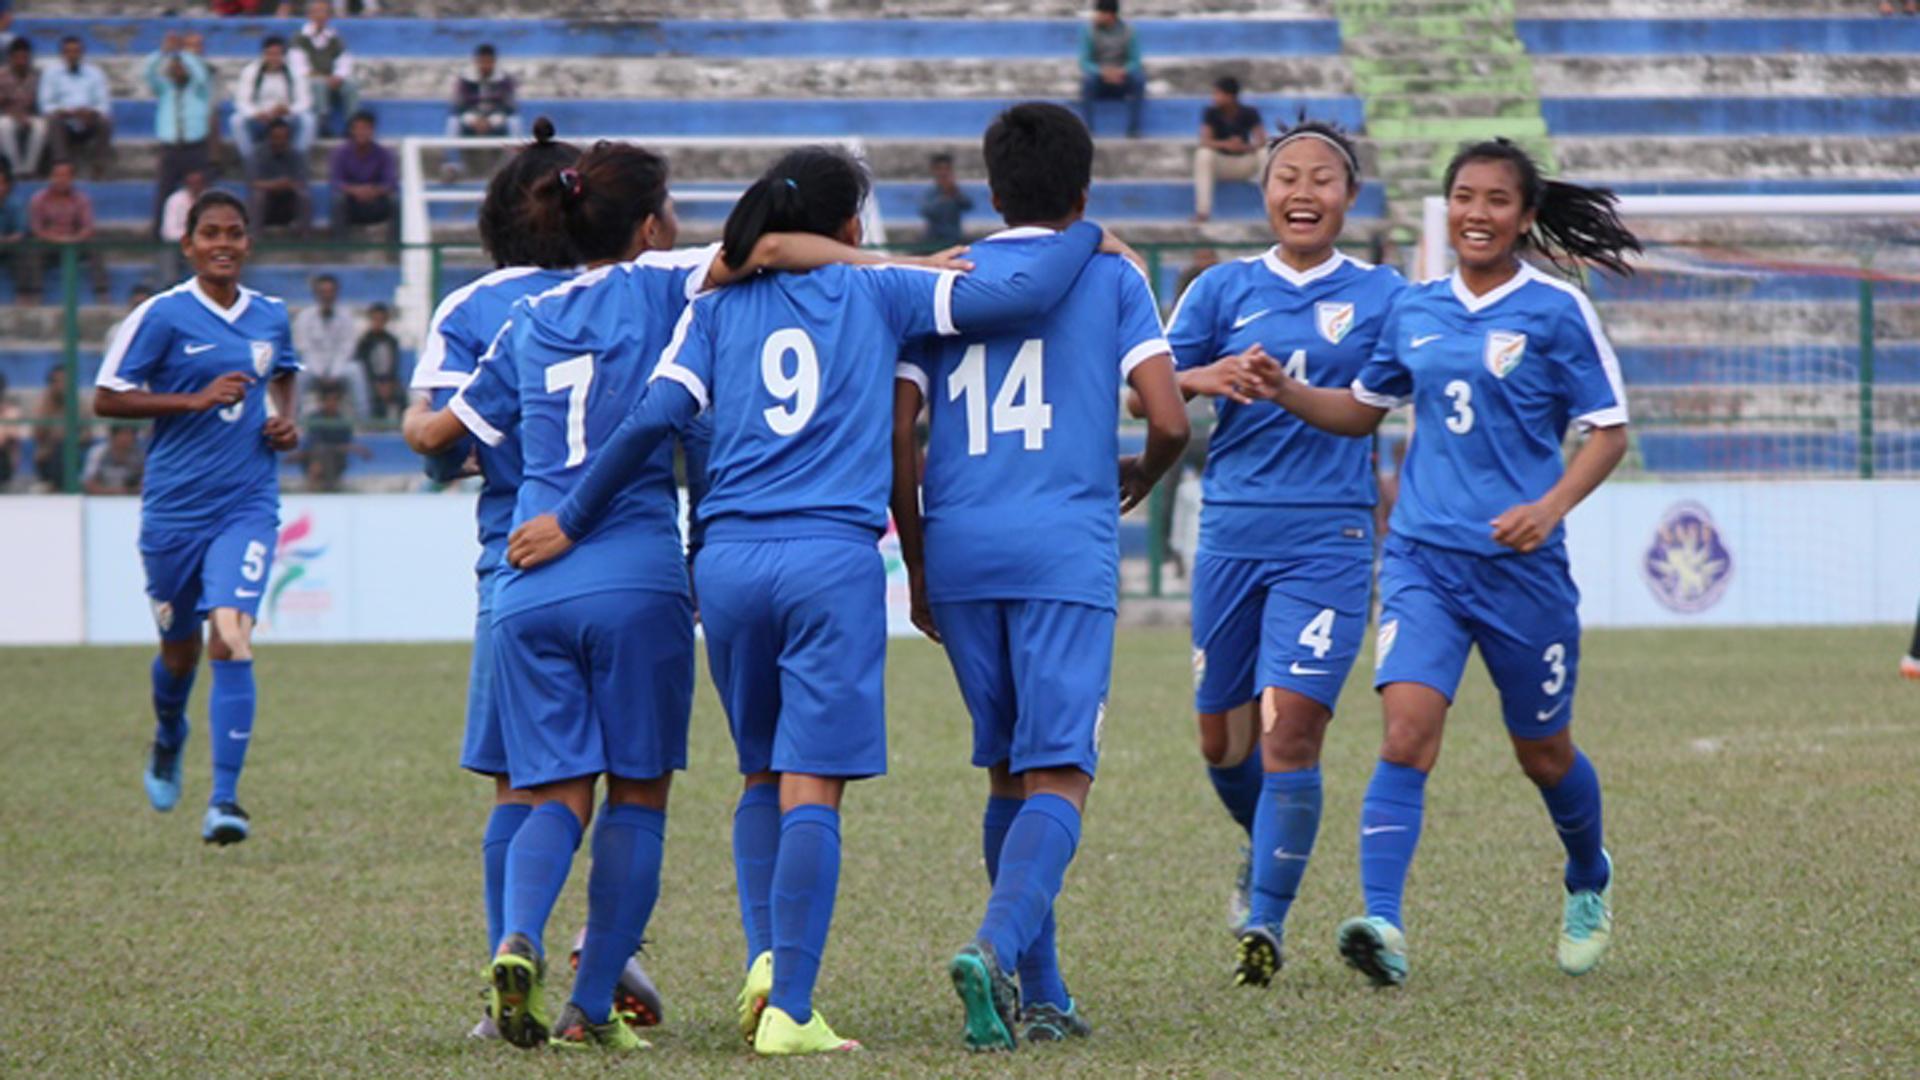 India-women-nepal-women-saff-womens-championship-2016_bp3tp7g5hqbw1qh7ibm5840ao